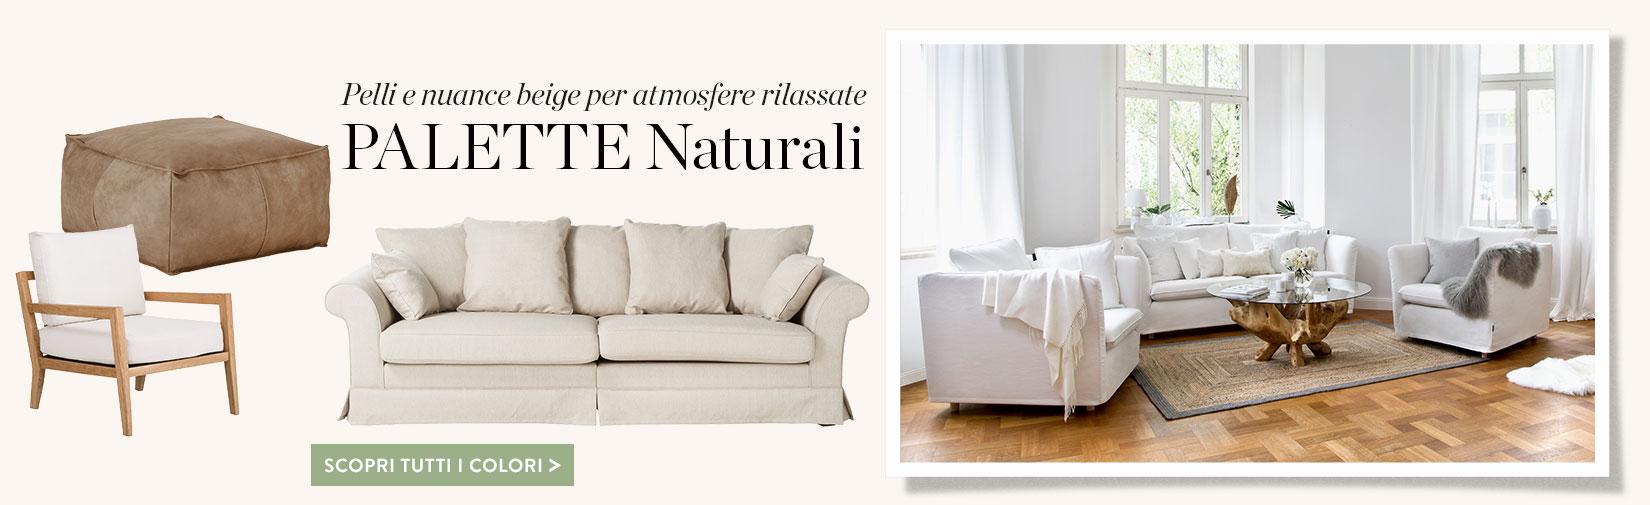 LP_Palette_naturali_Desktop